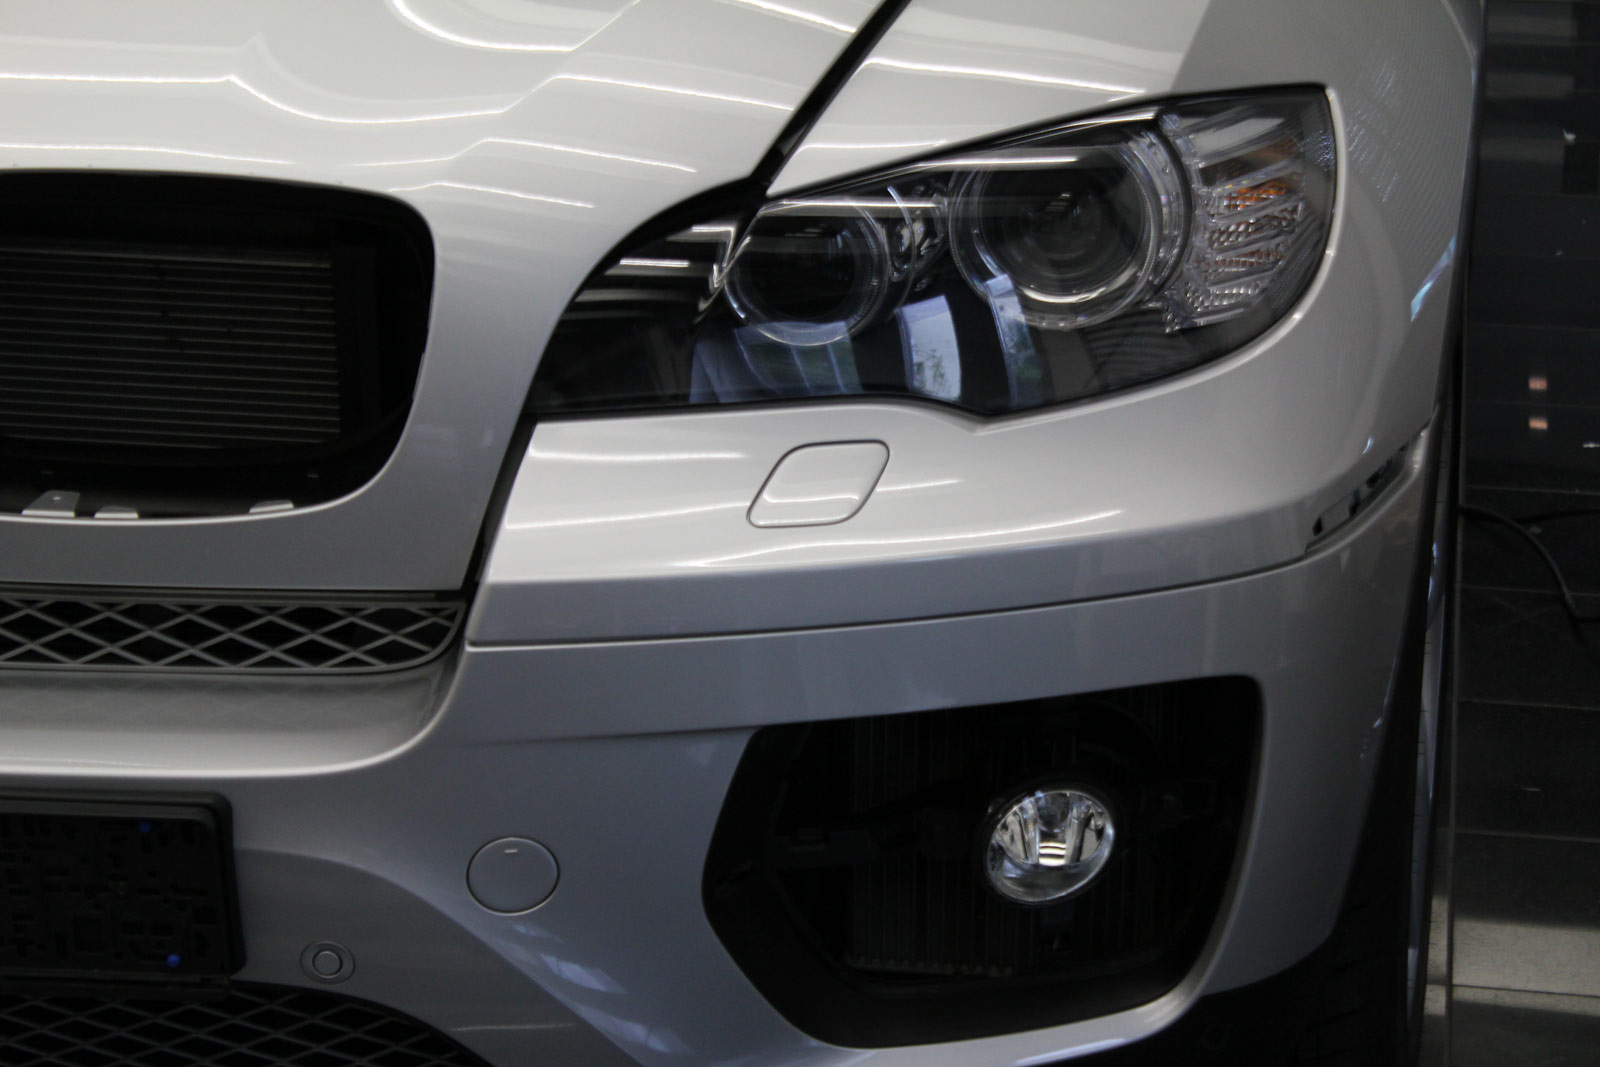 BMW_X6_Folierung_Anthrazit_Metallic_Matt_10